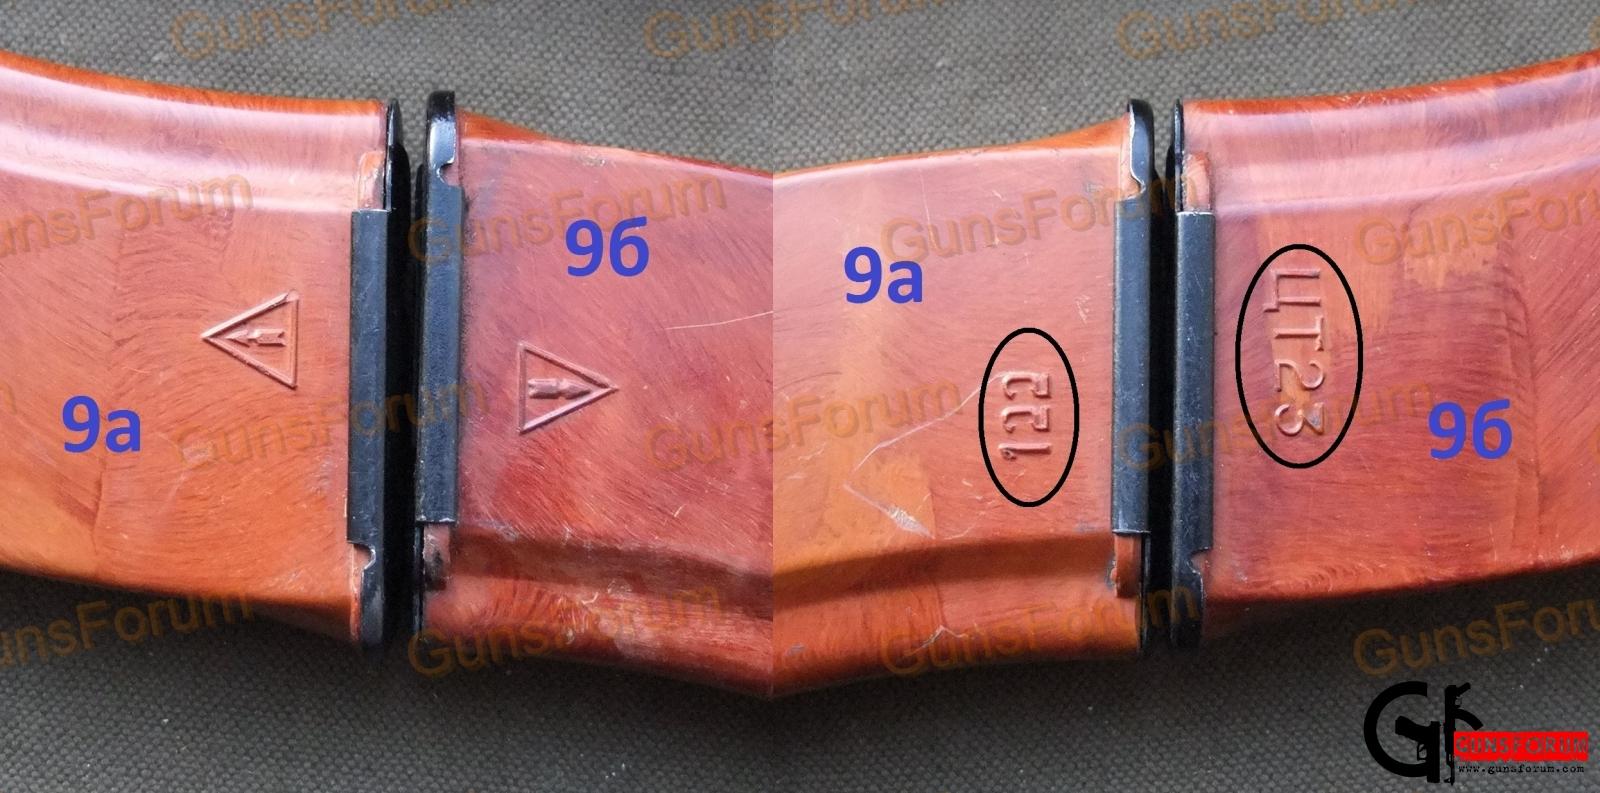 large_53.JPG.0bdd4f85aba32e9d2e82f40a75992abf.JPG